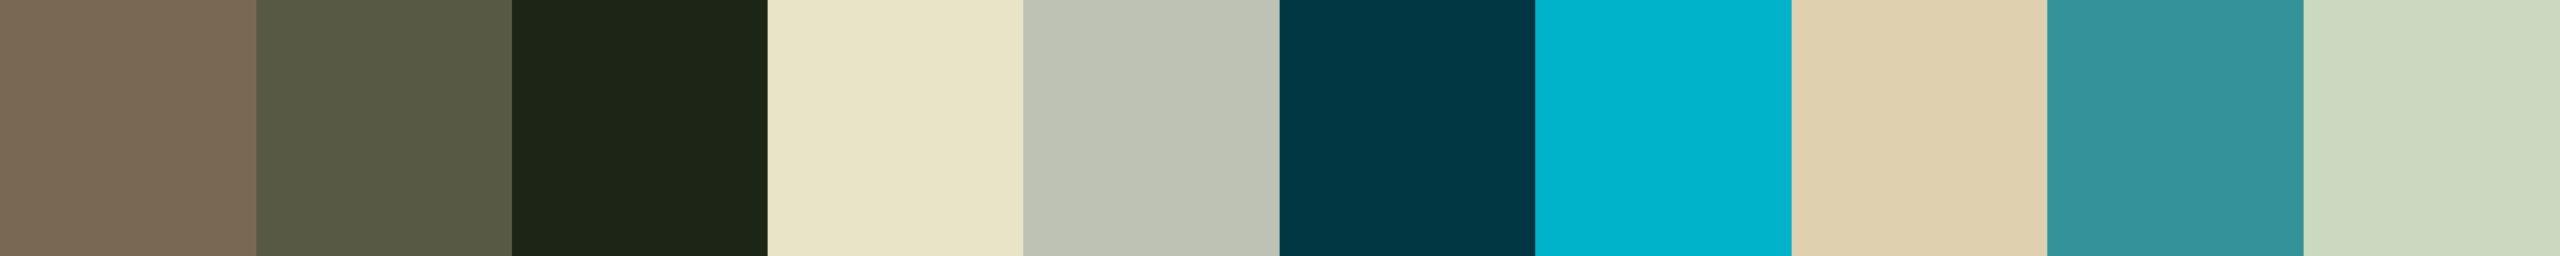 773 Hacokita Color Palette